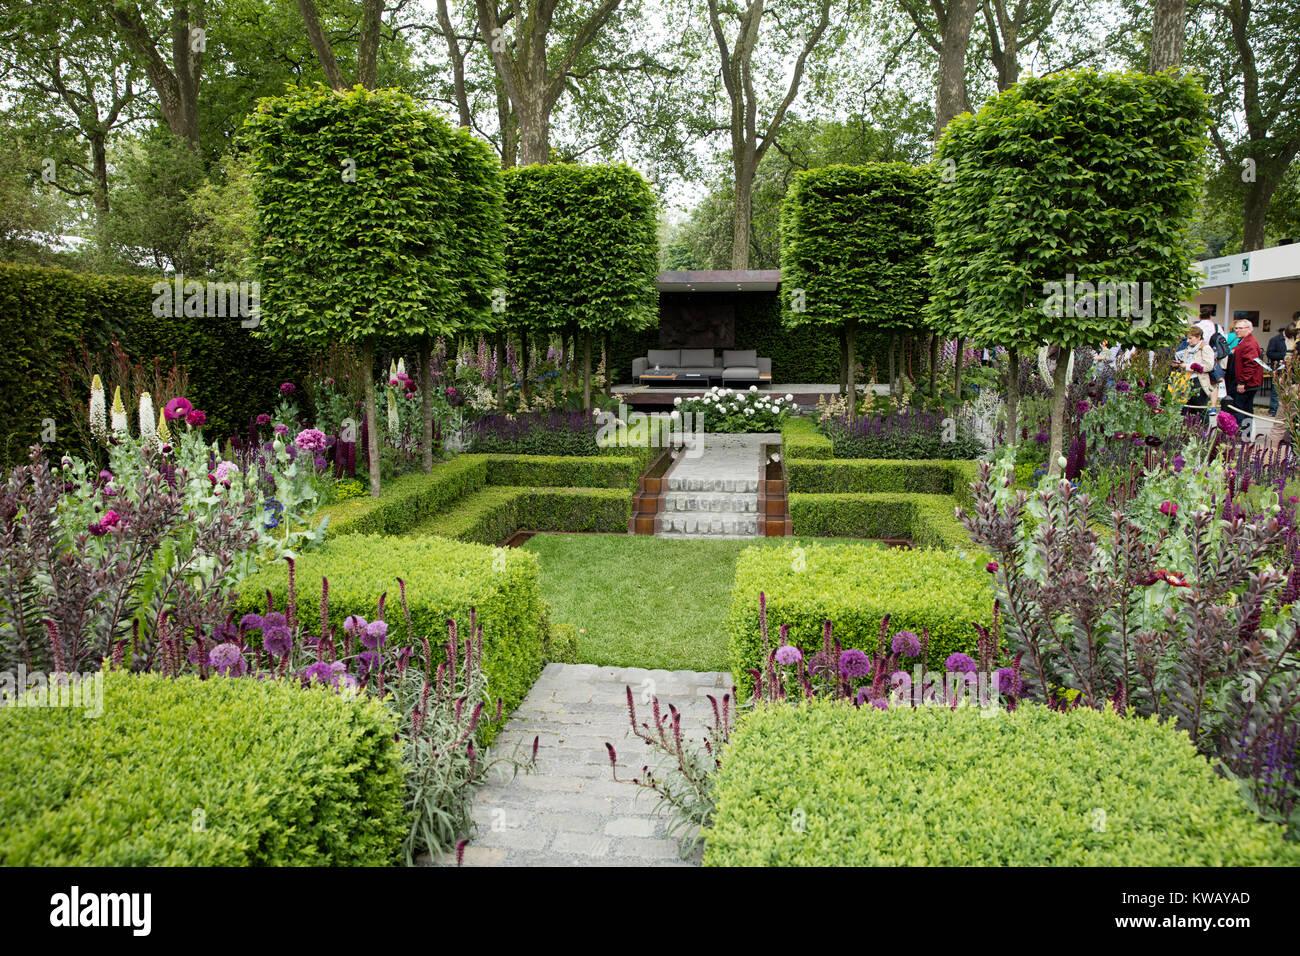 The Husqvarna Garden by Charlie Albone, RHS Chelsea Flower Show 2016, Chelsea, London, UK - May 2016 - Stock Image